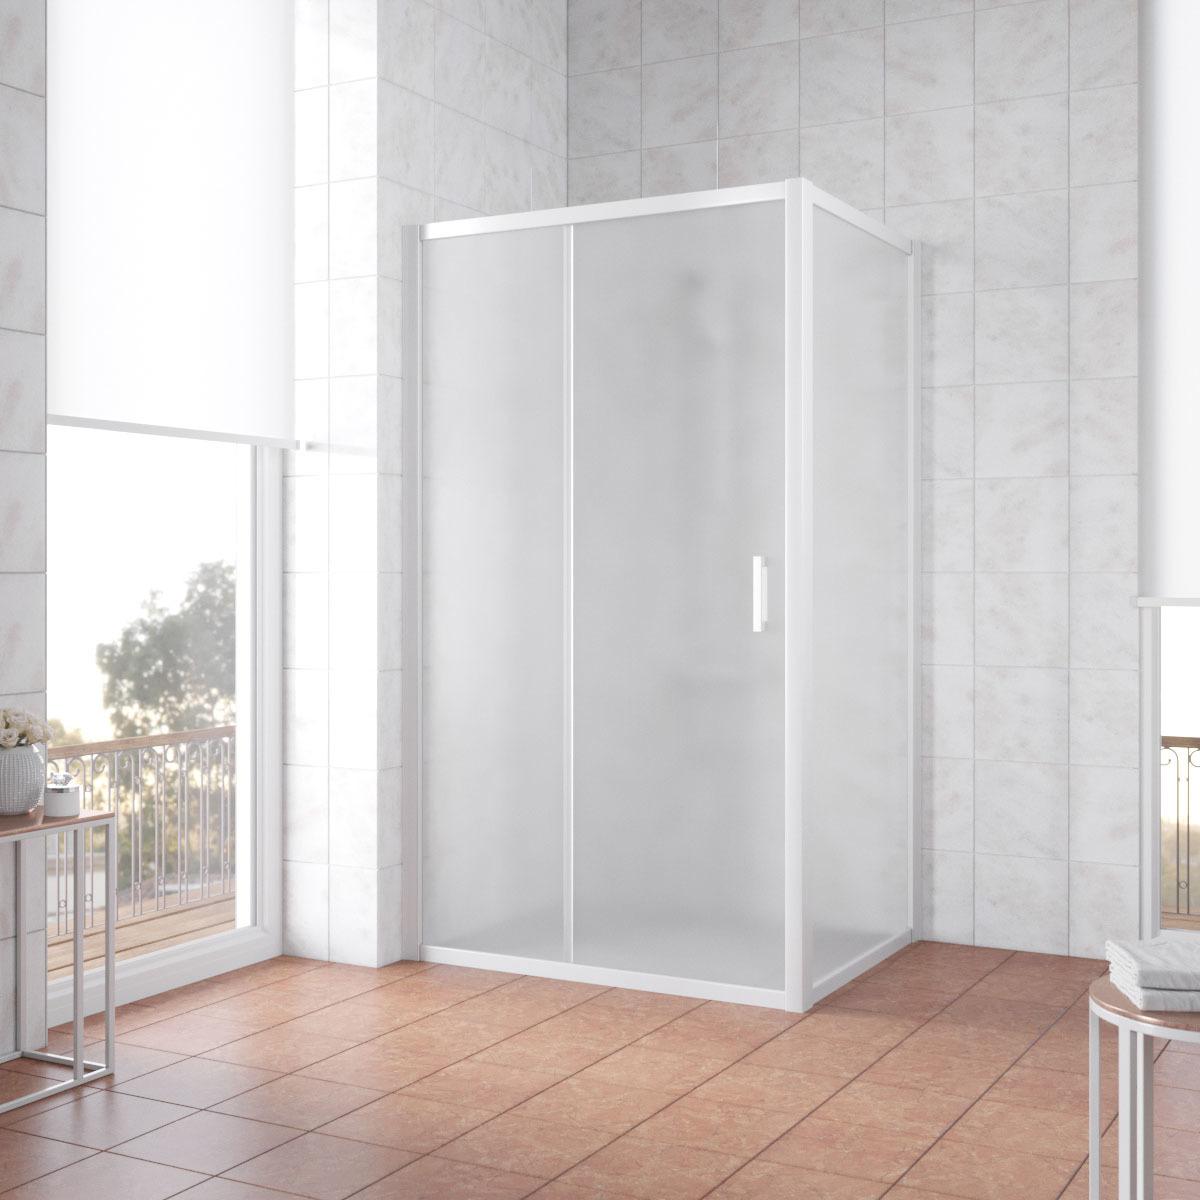 Душевой уголок Vegas Glass ZP+ZPV профиль белый, стекло сатин